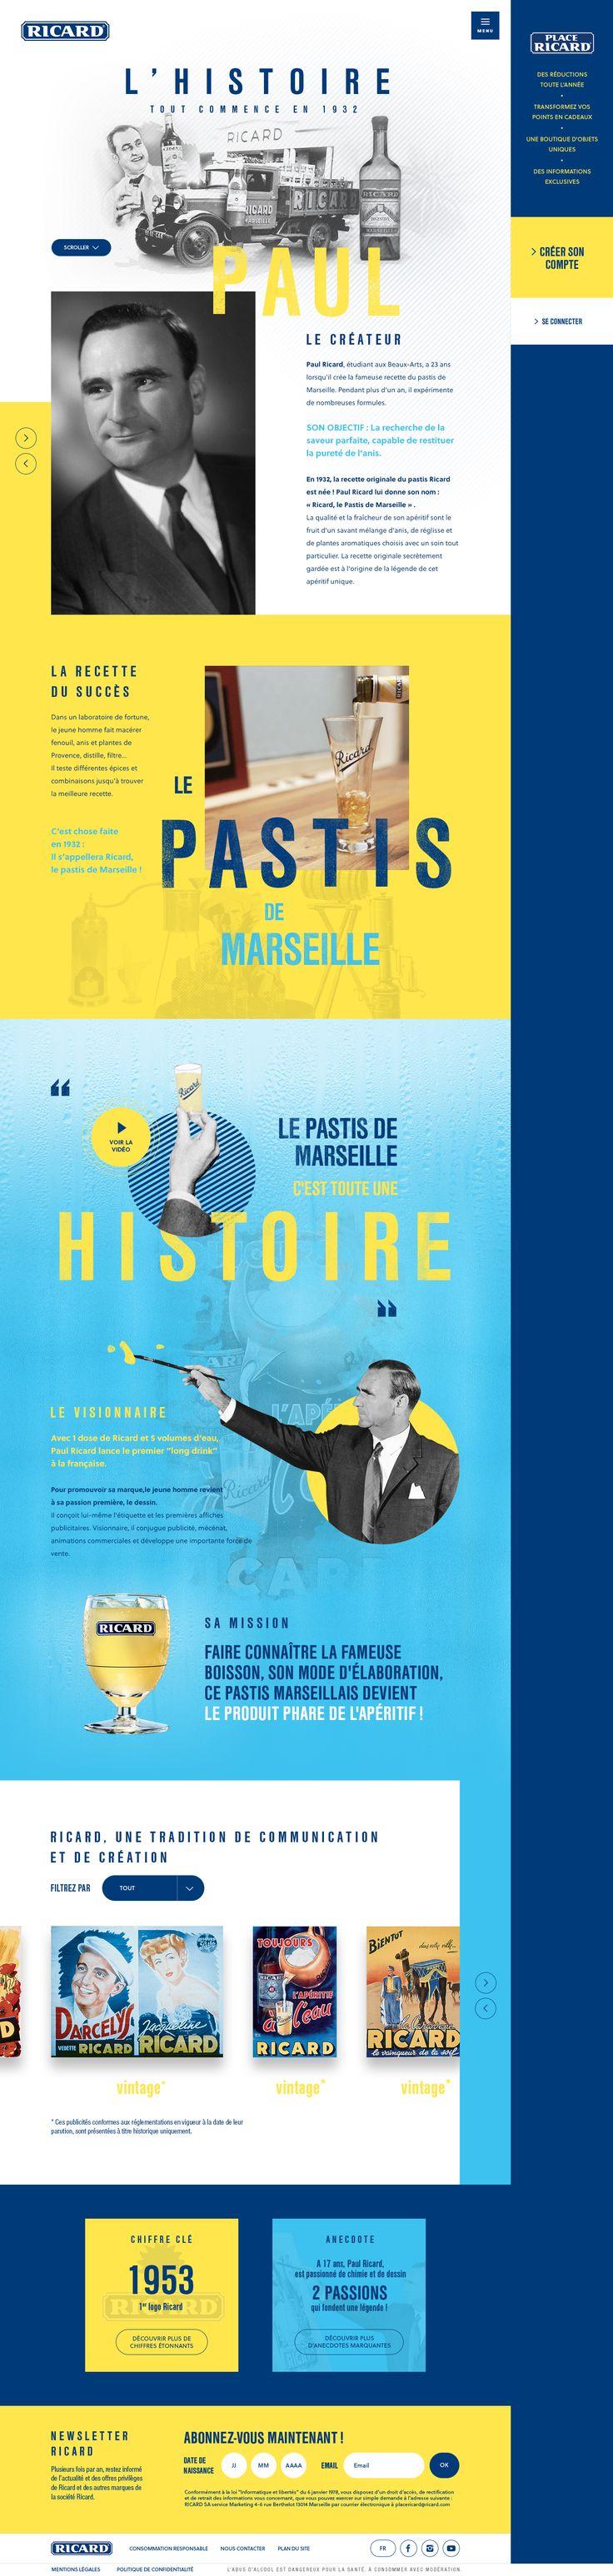 Ricard - L'histoire